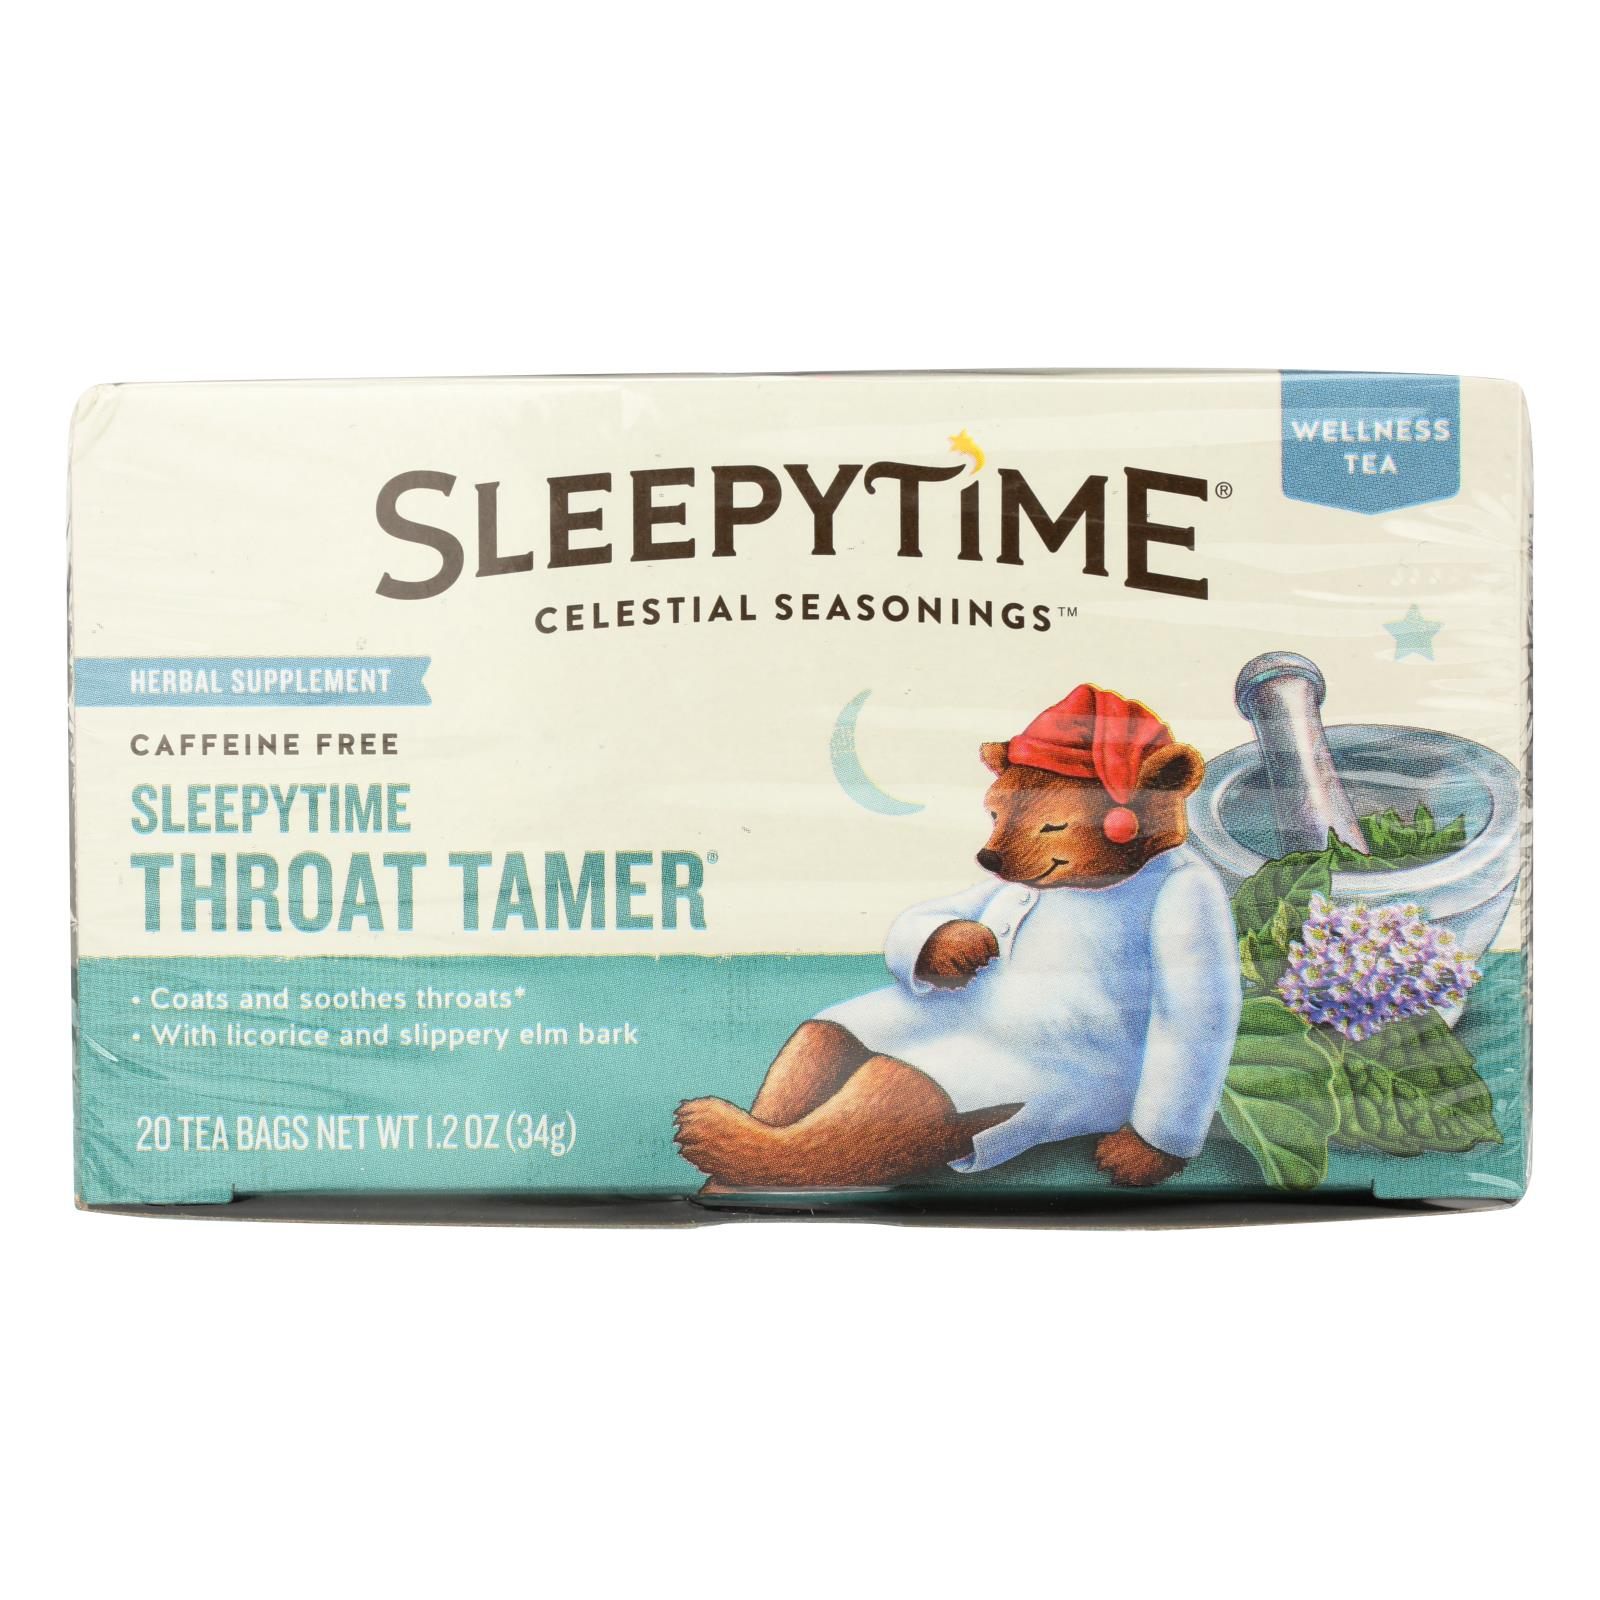 Celestial Seasonings Throat Tamer Herbal Tea - Case of 6 - 20 BAG